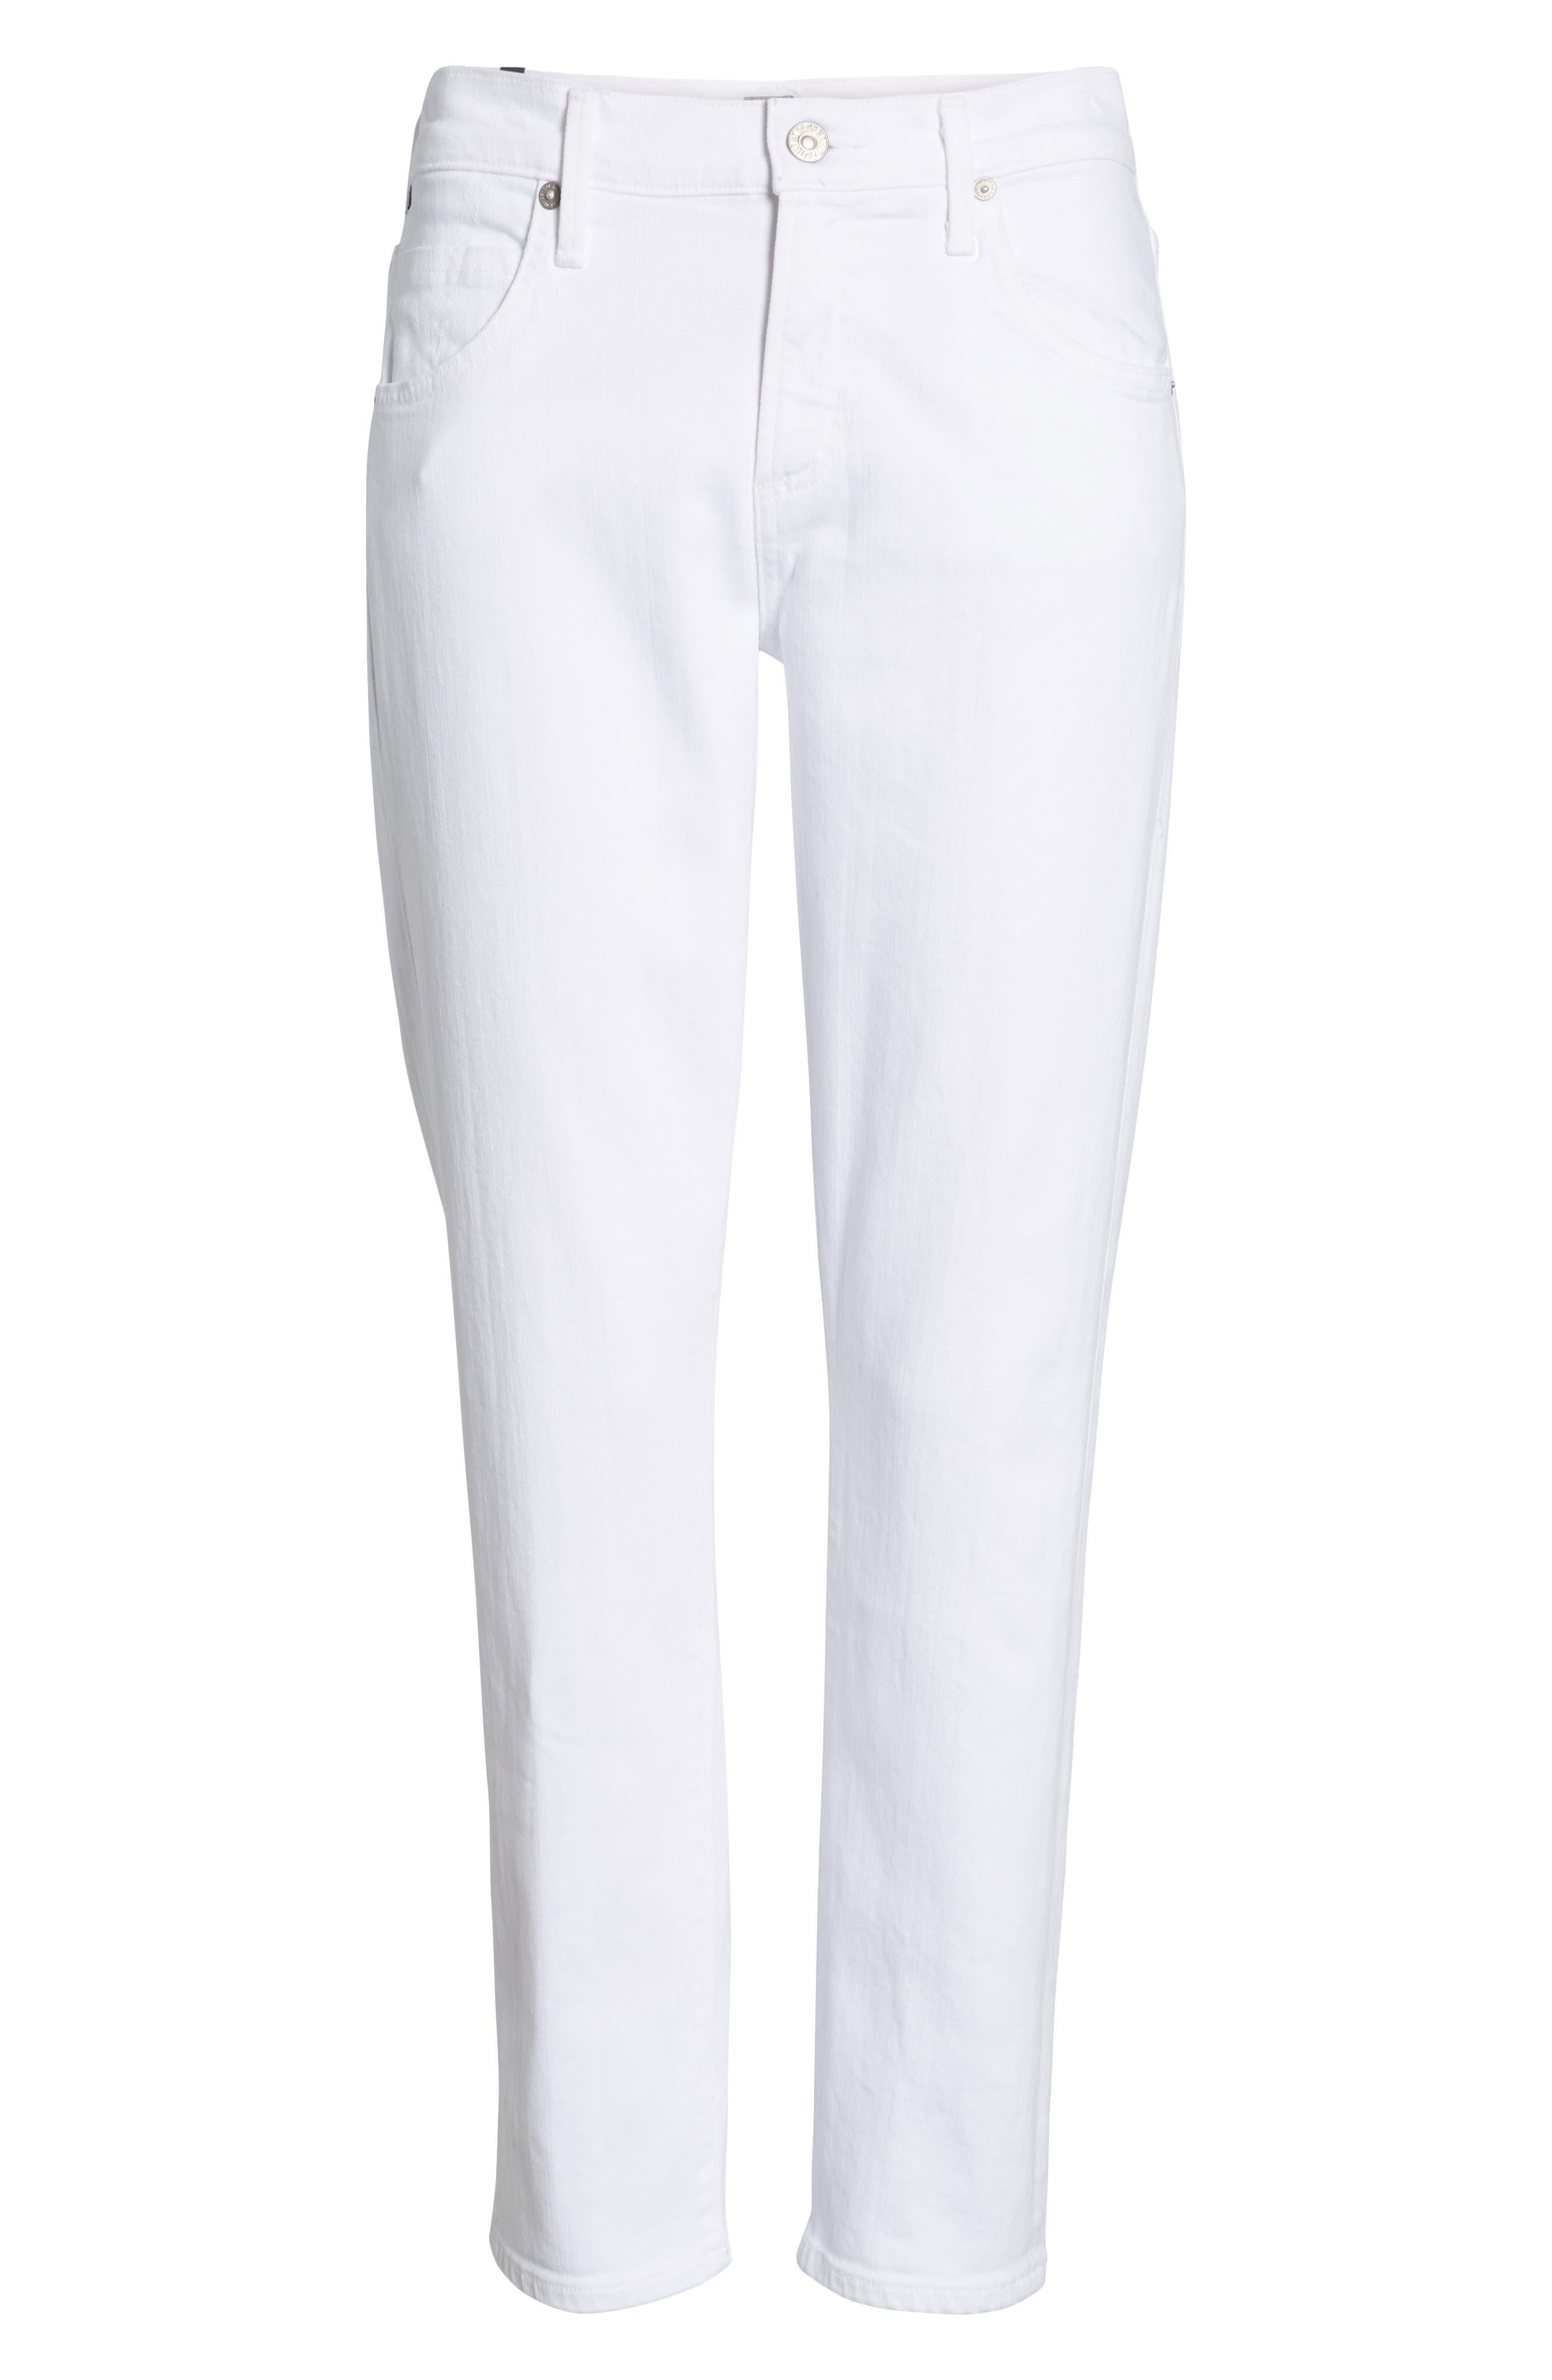 Elsa Ankle Skinny Jeans,                             Alternate thumbnail 7, color,                             OPTIC WHITE